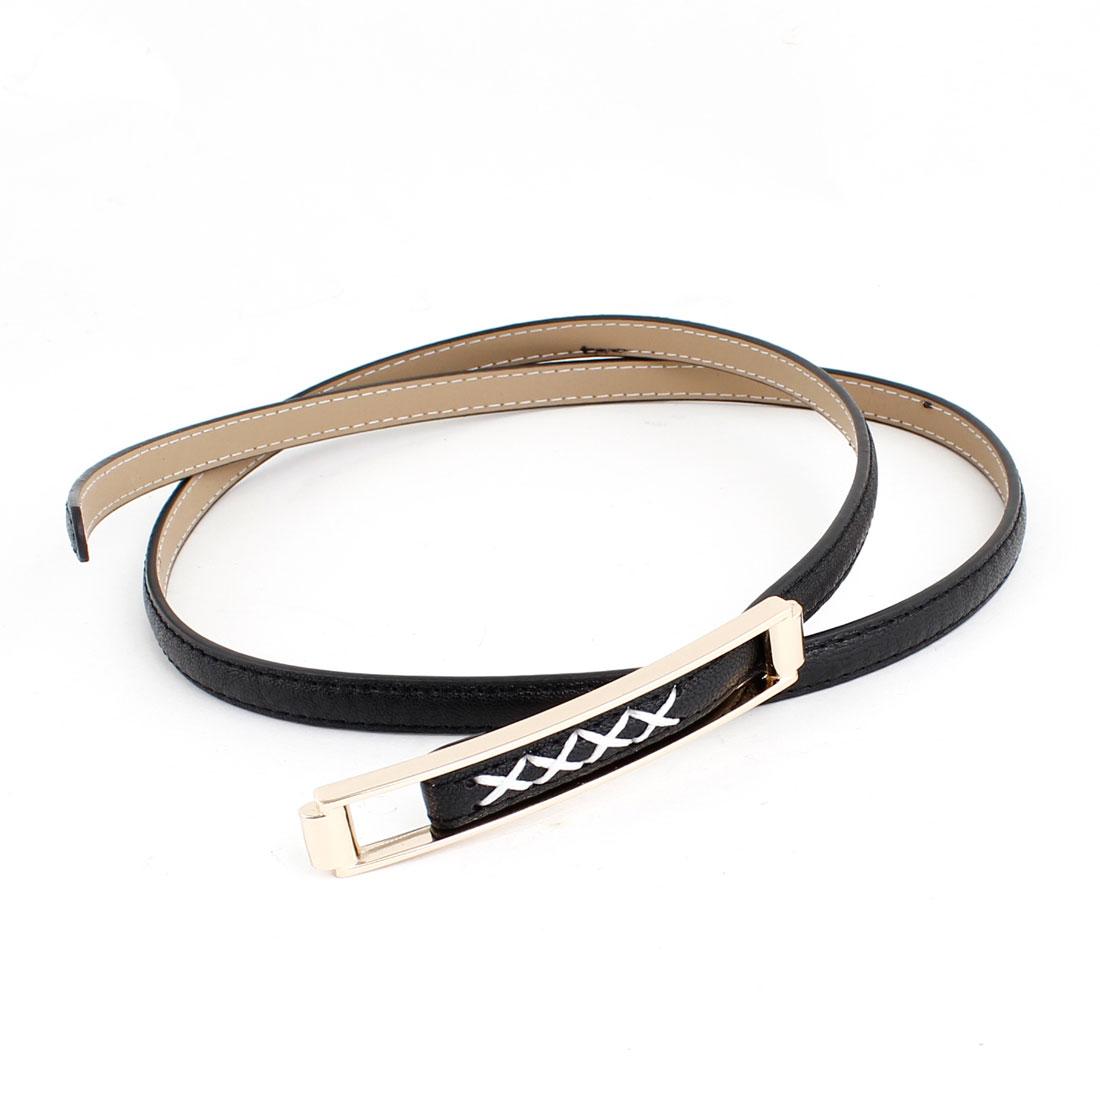 Woman Lady Black Faux Leather Wrapped Adjustable Slim Waist Belt